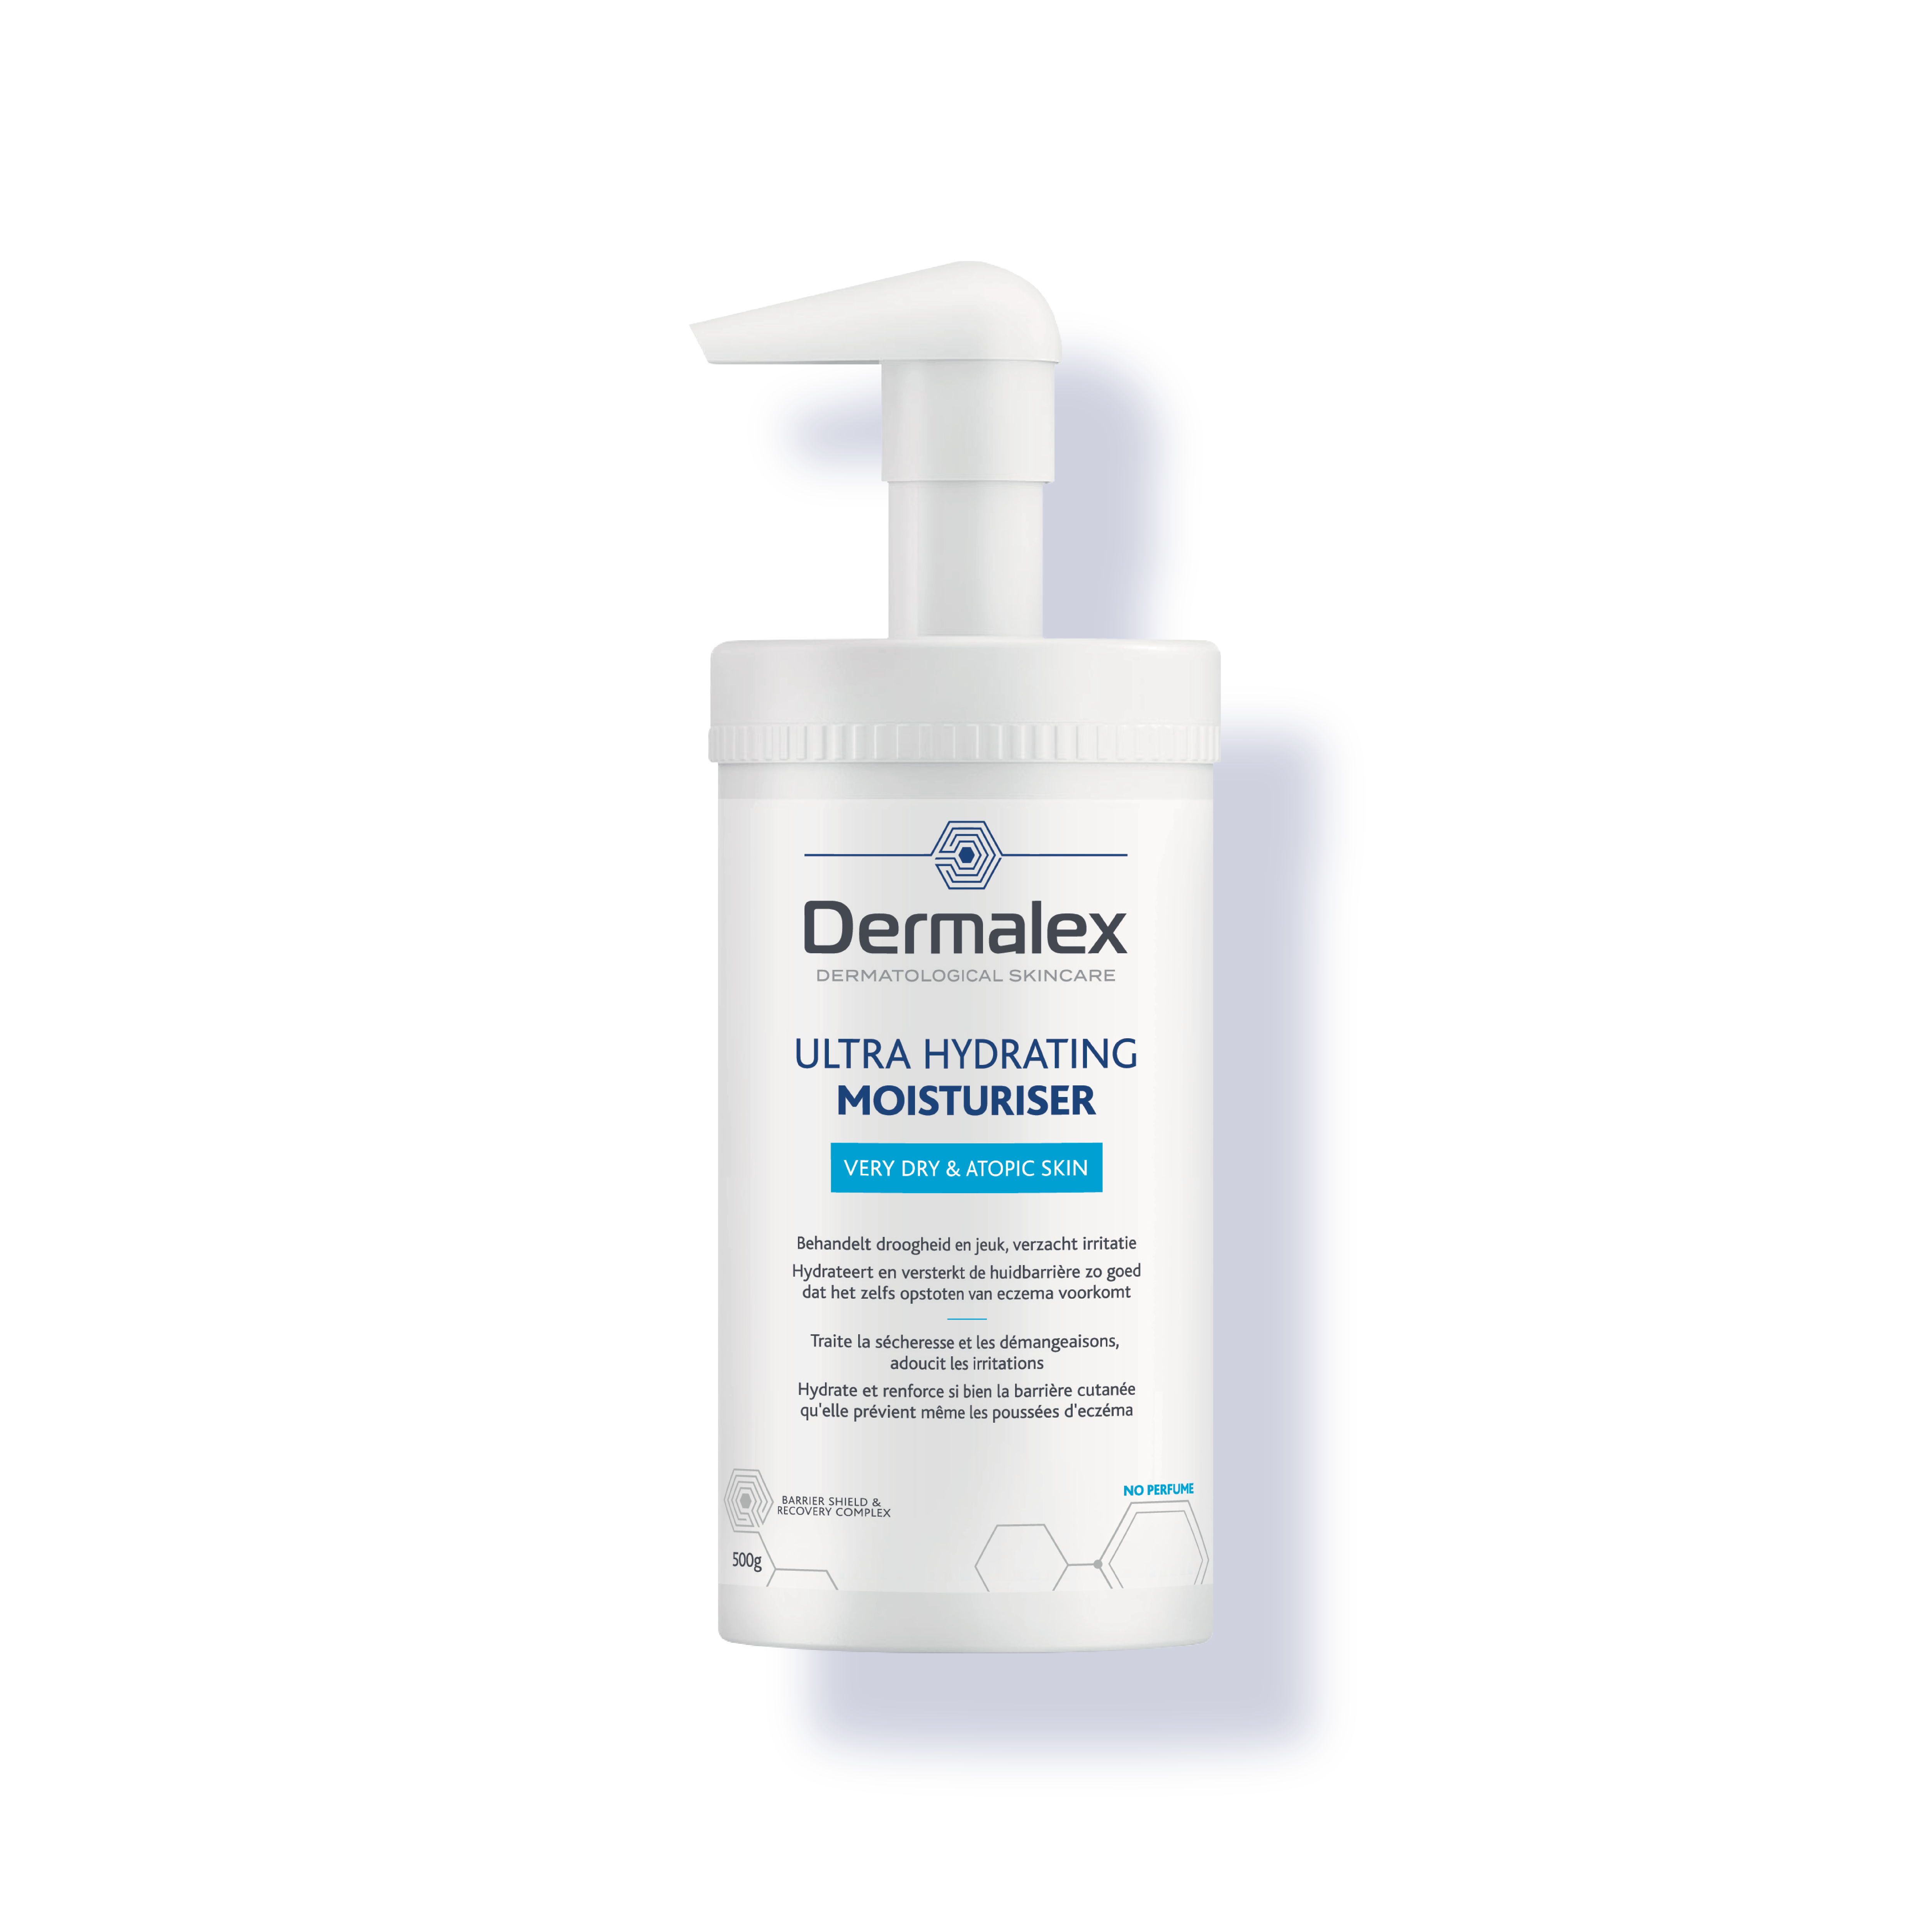 Dermalex Ultra Hydrating Moisturiser 500g